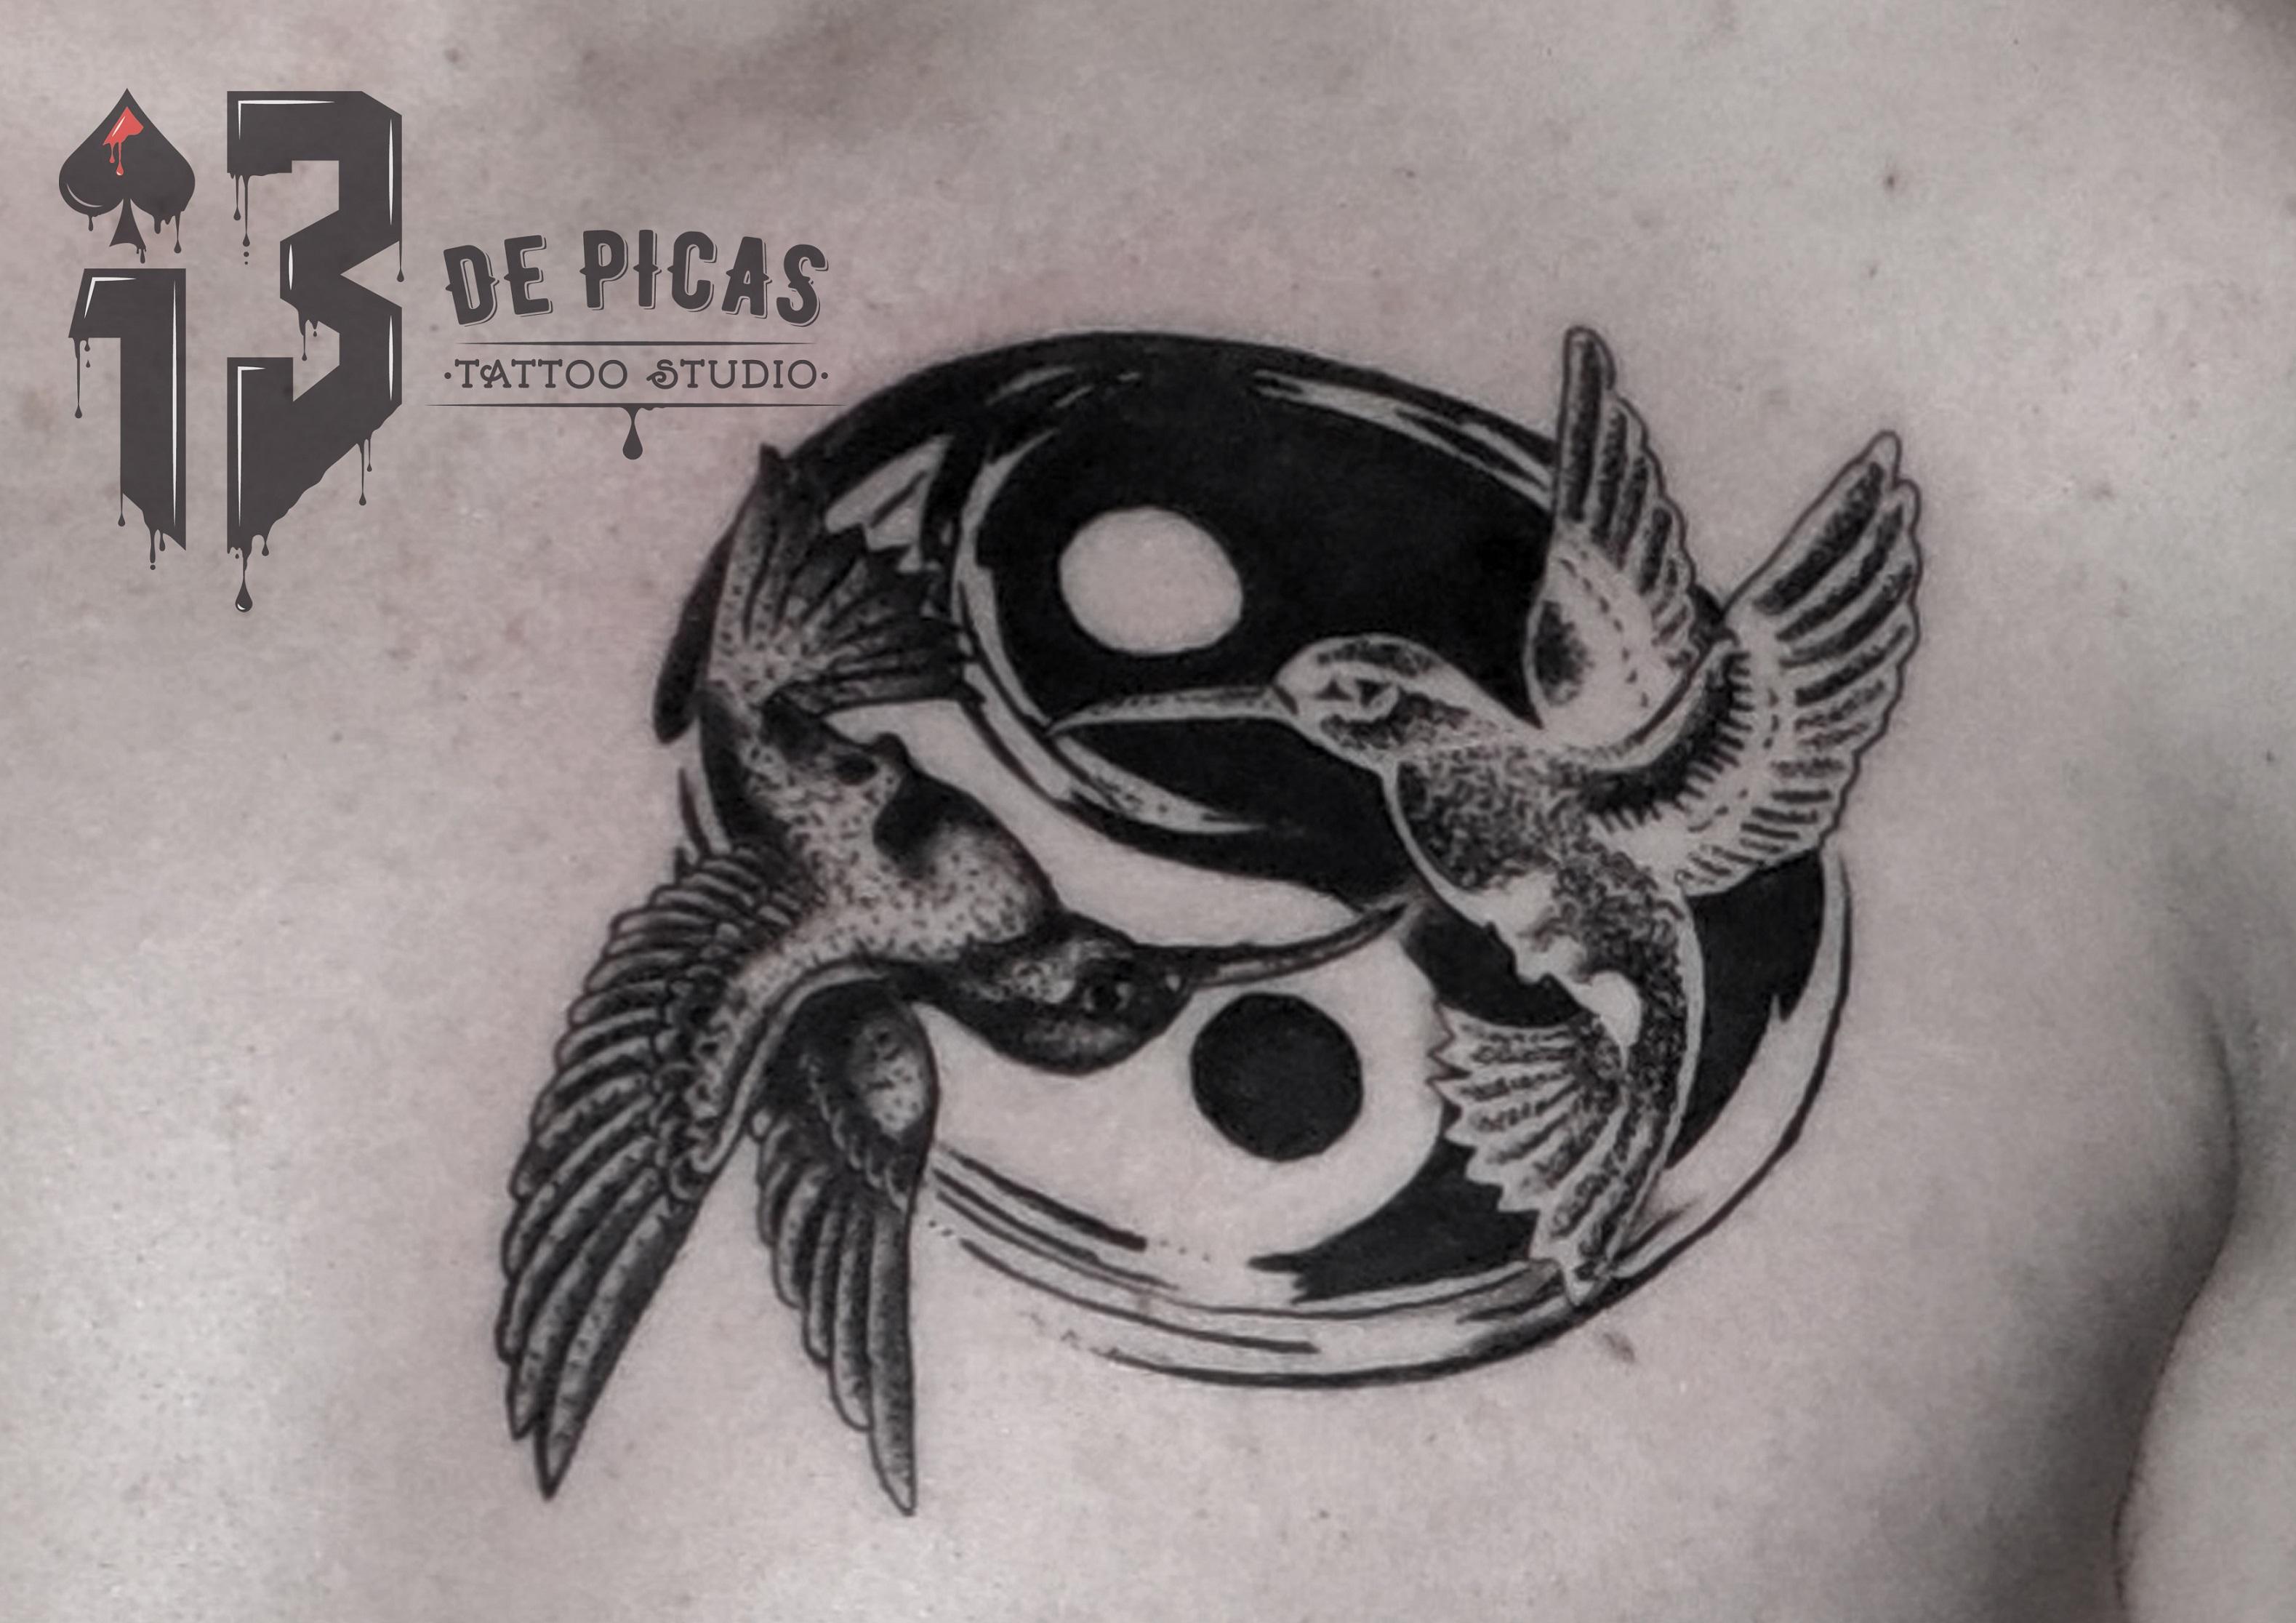 colibries yinyang tatuaje tattoo pecho black grey pájaros 13depicas